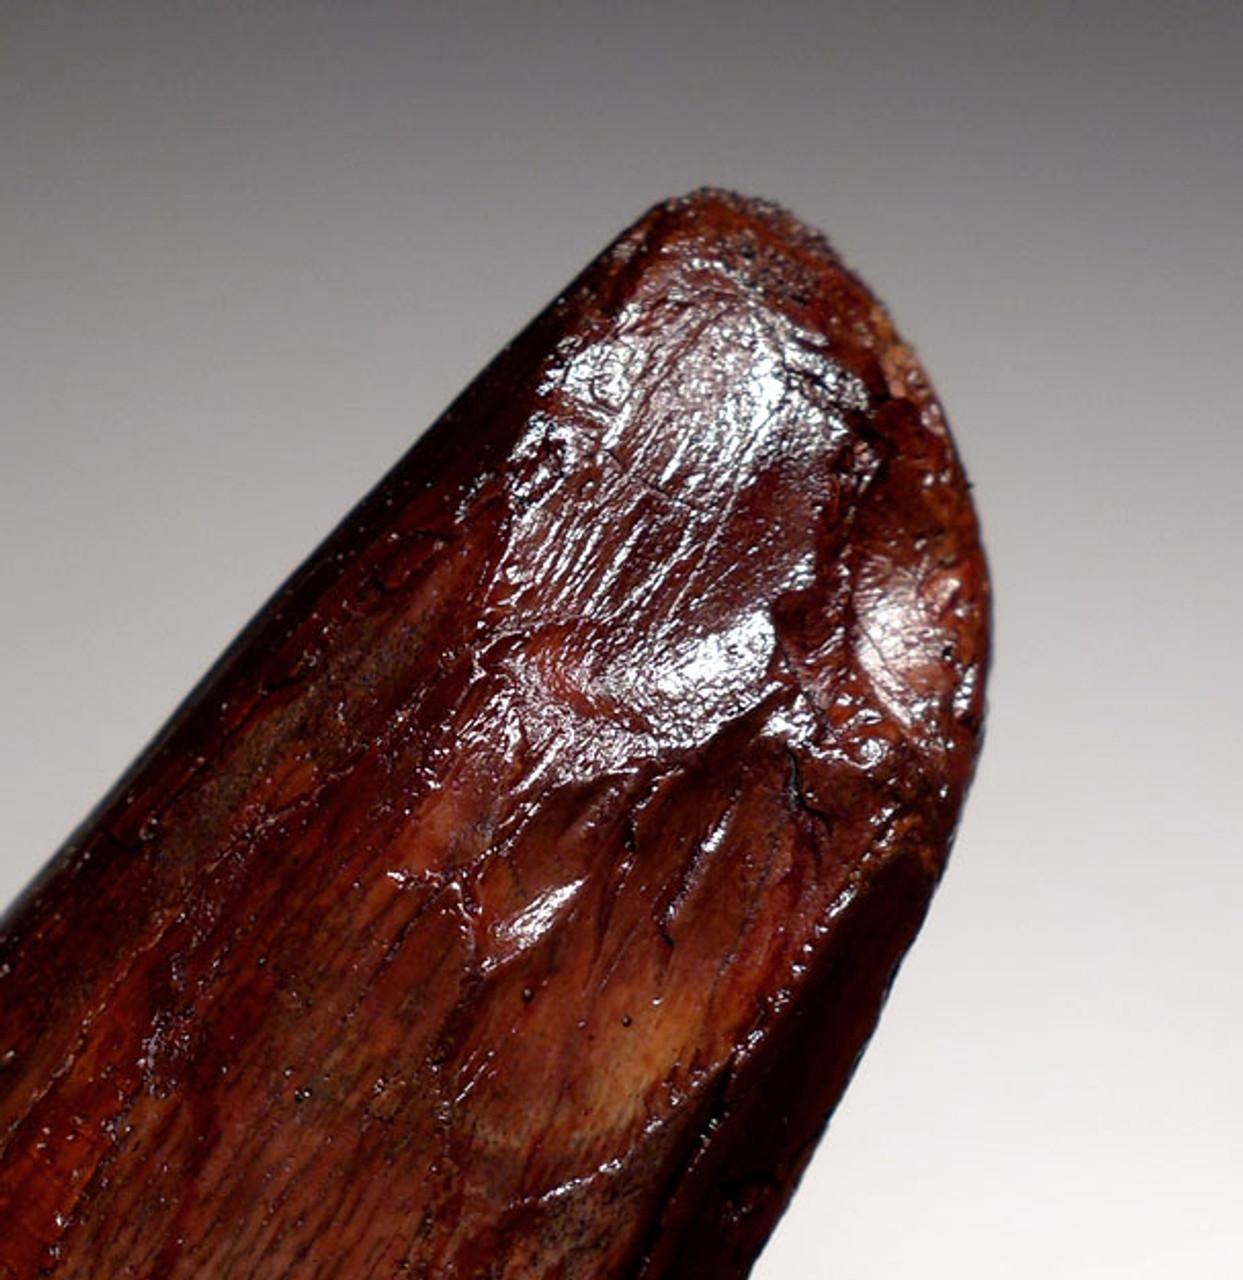 DT5-255 - 3 INCH UNBROKEN SPINOSAURUS DINOSAUR TOOTH WITH WINE RED ENAMEL